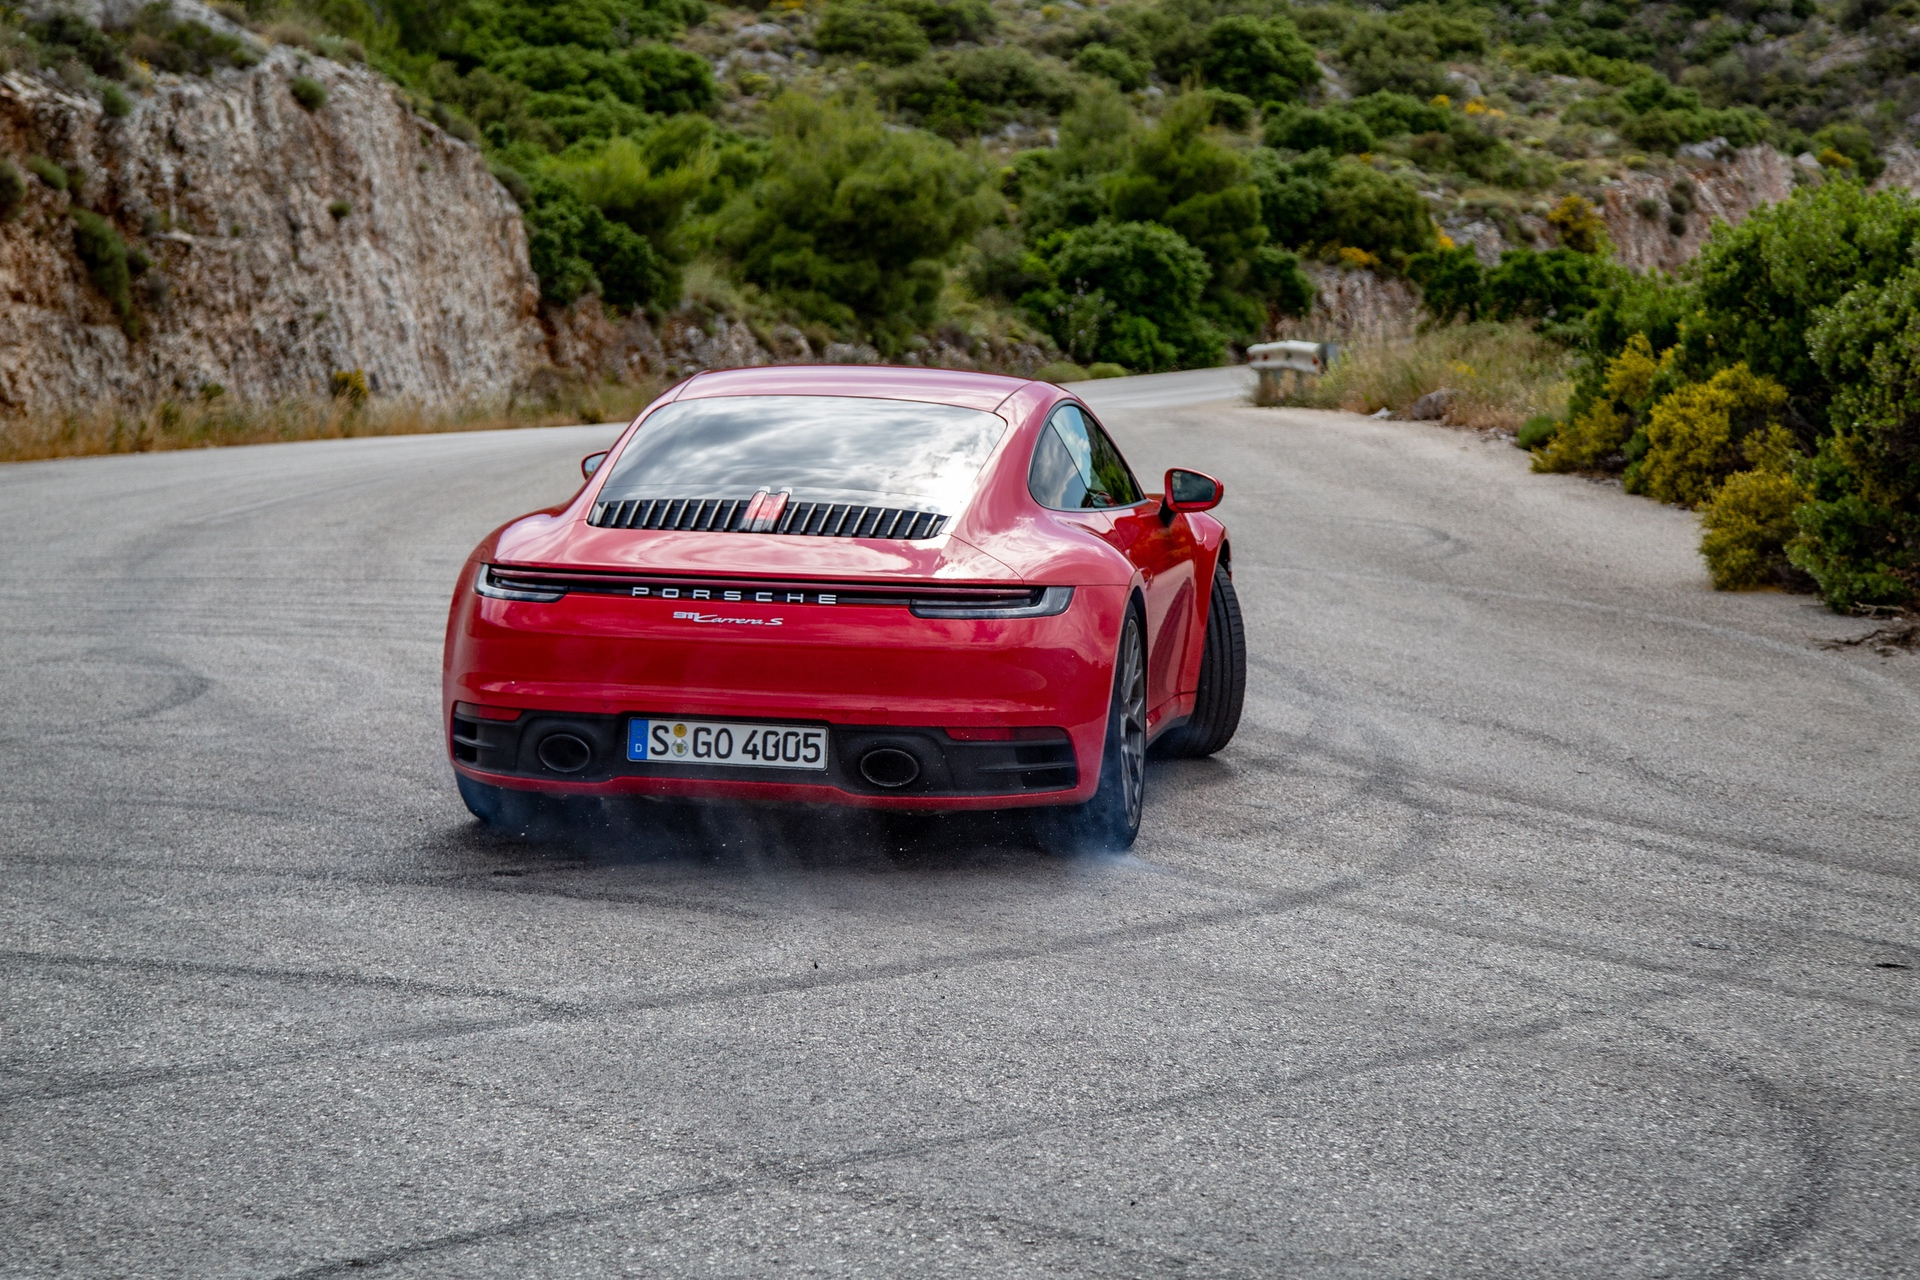 Test_Drive_Porsche_911_Athens_0009